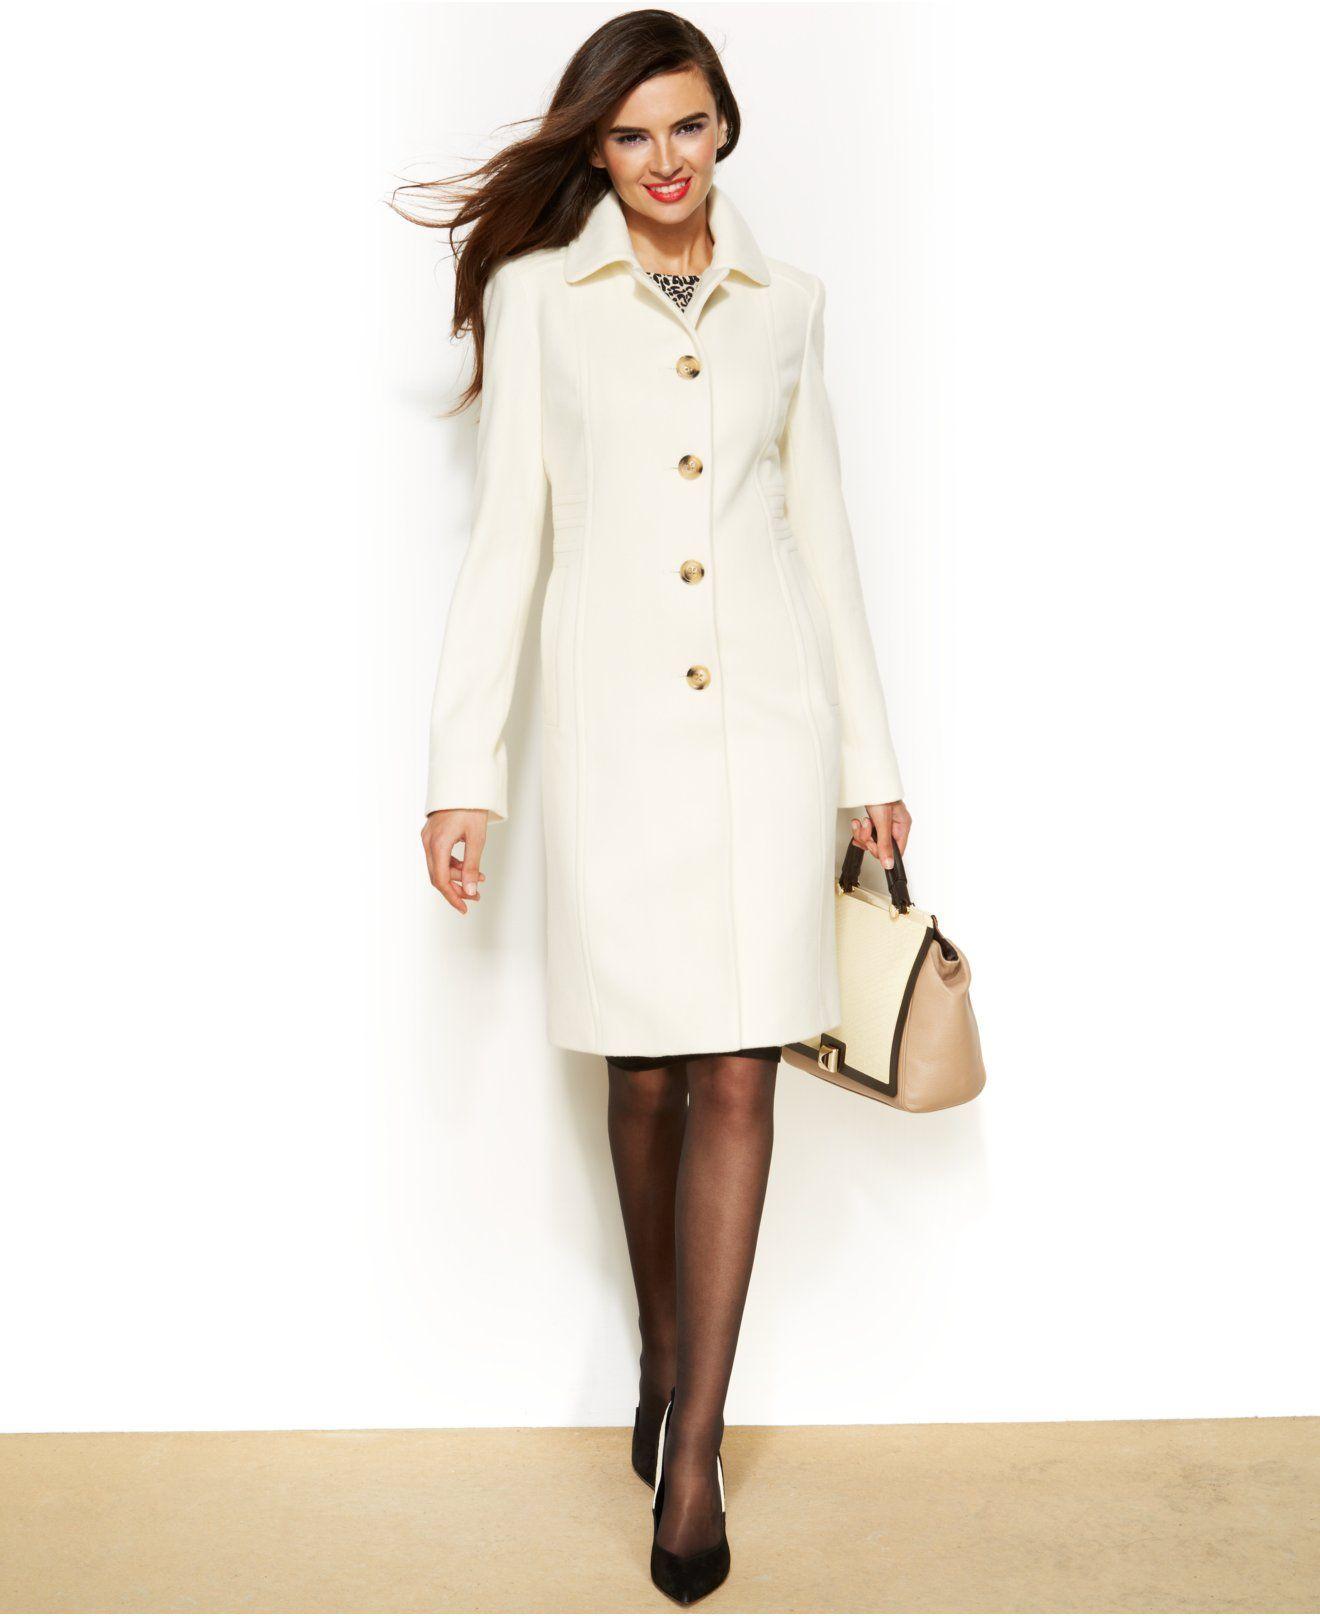 Anne Klein Wool Cashmere Blend Club Collar Walker Coat Coats Women Macy S Elegant Coats Coats For Women Fashion [ 1616 x 1320 Pixel ]